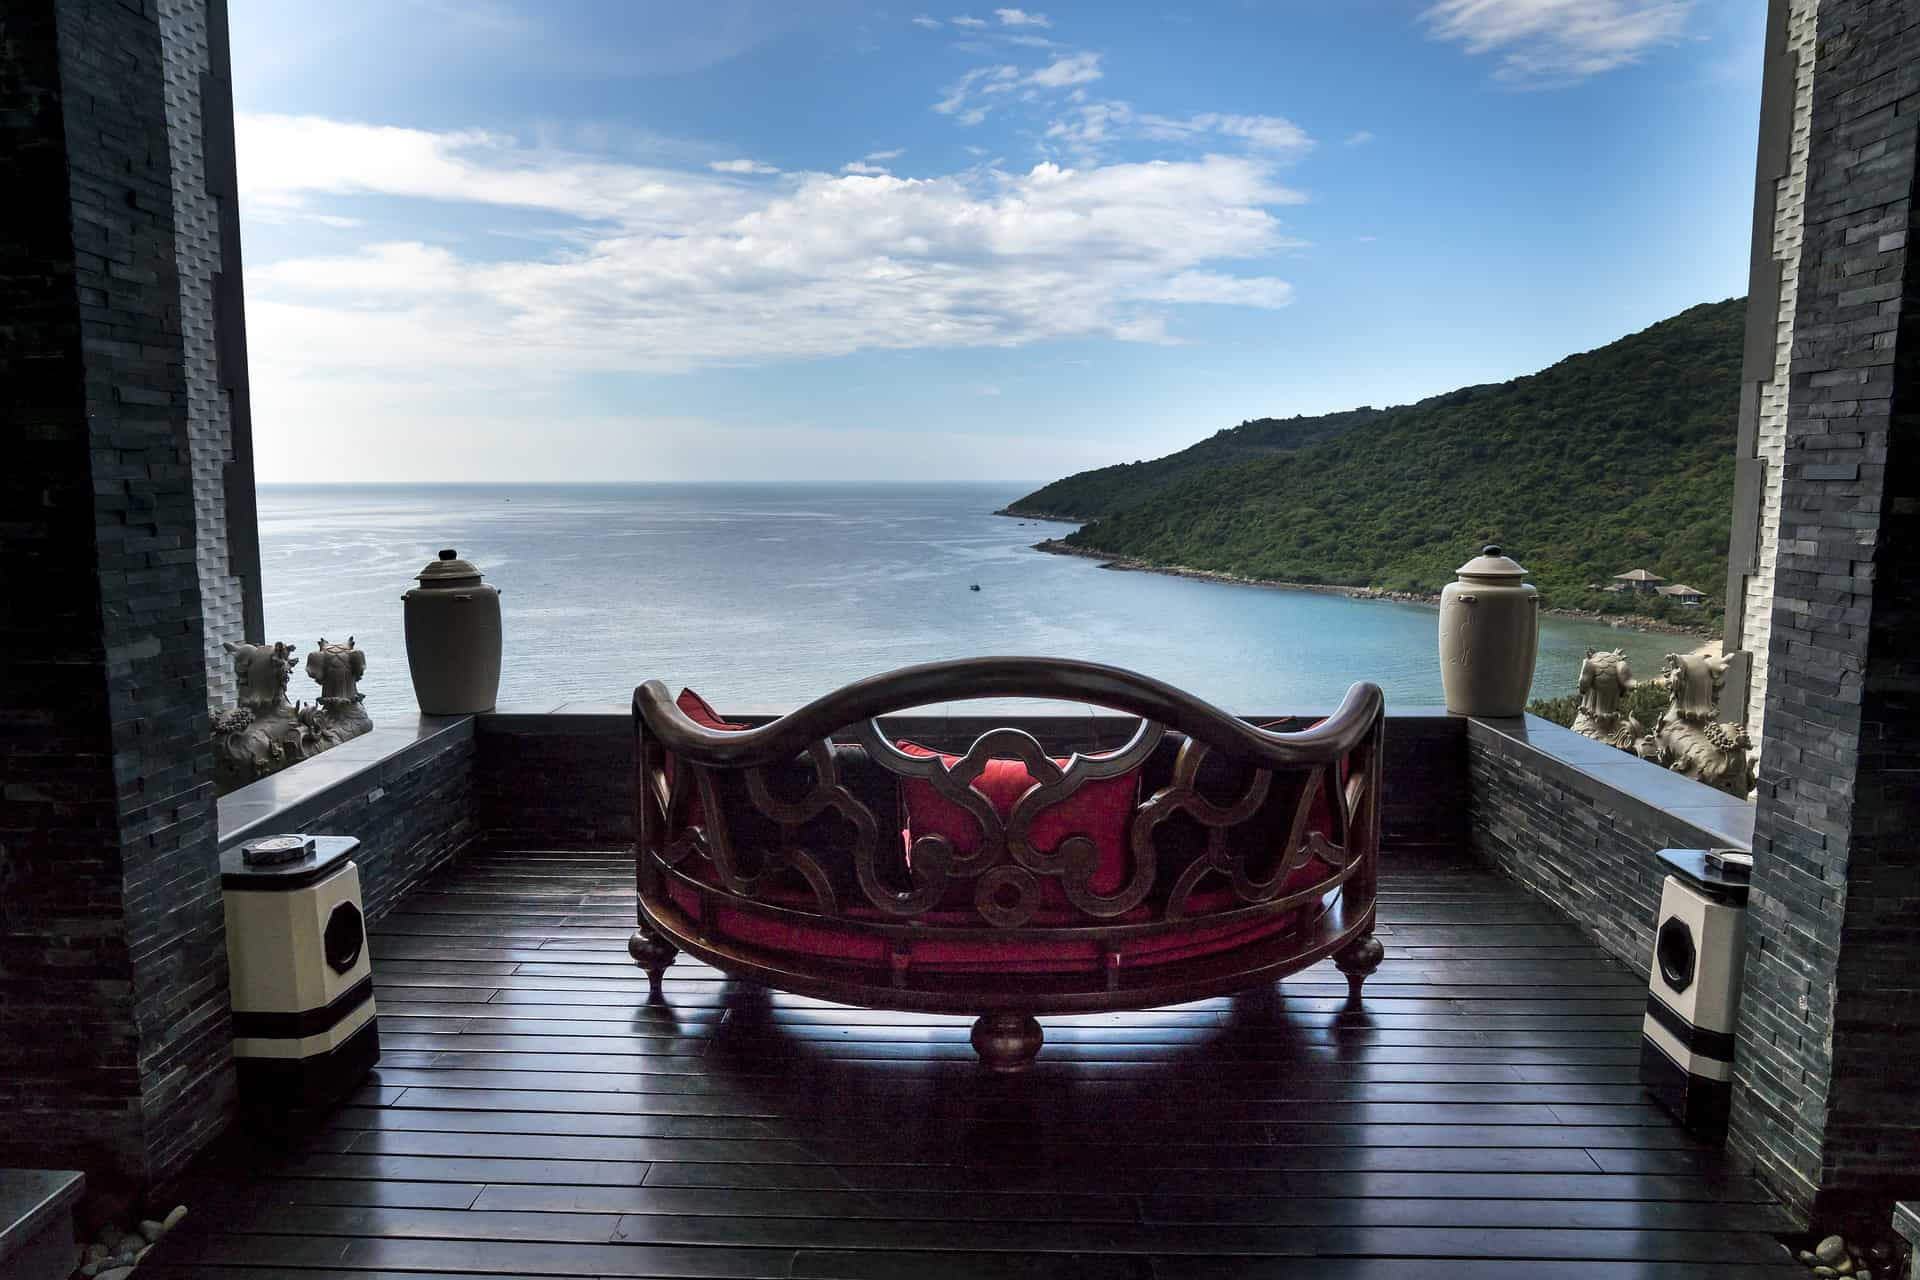 Meeting Point Hotels - LABRANDA , Lemon & Soul FTI Group